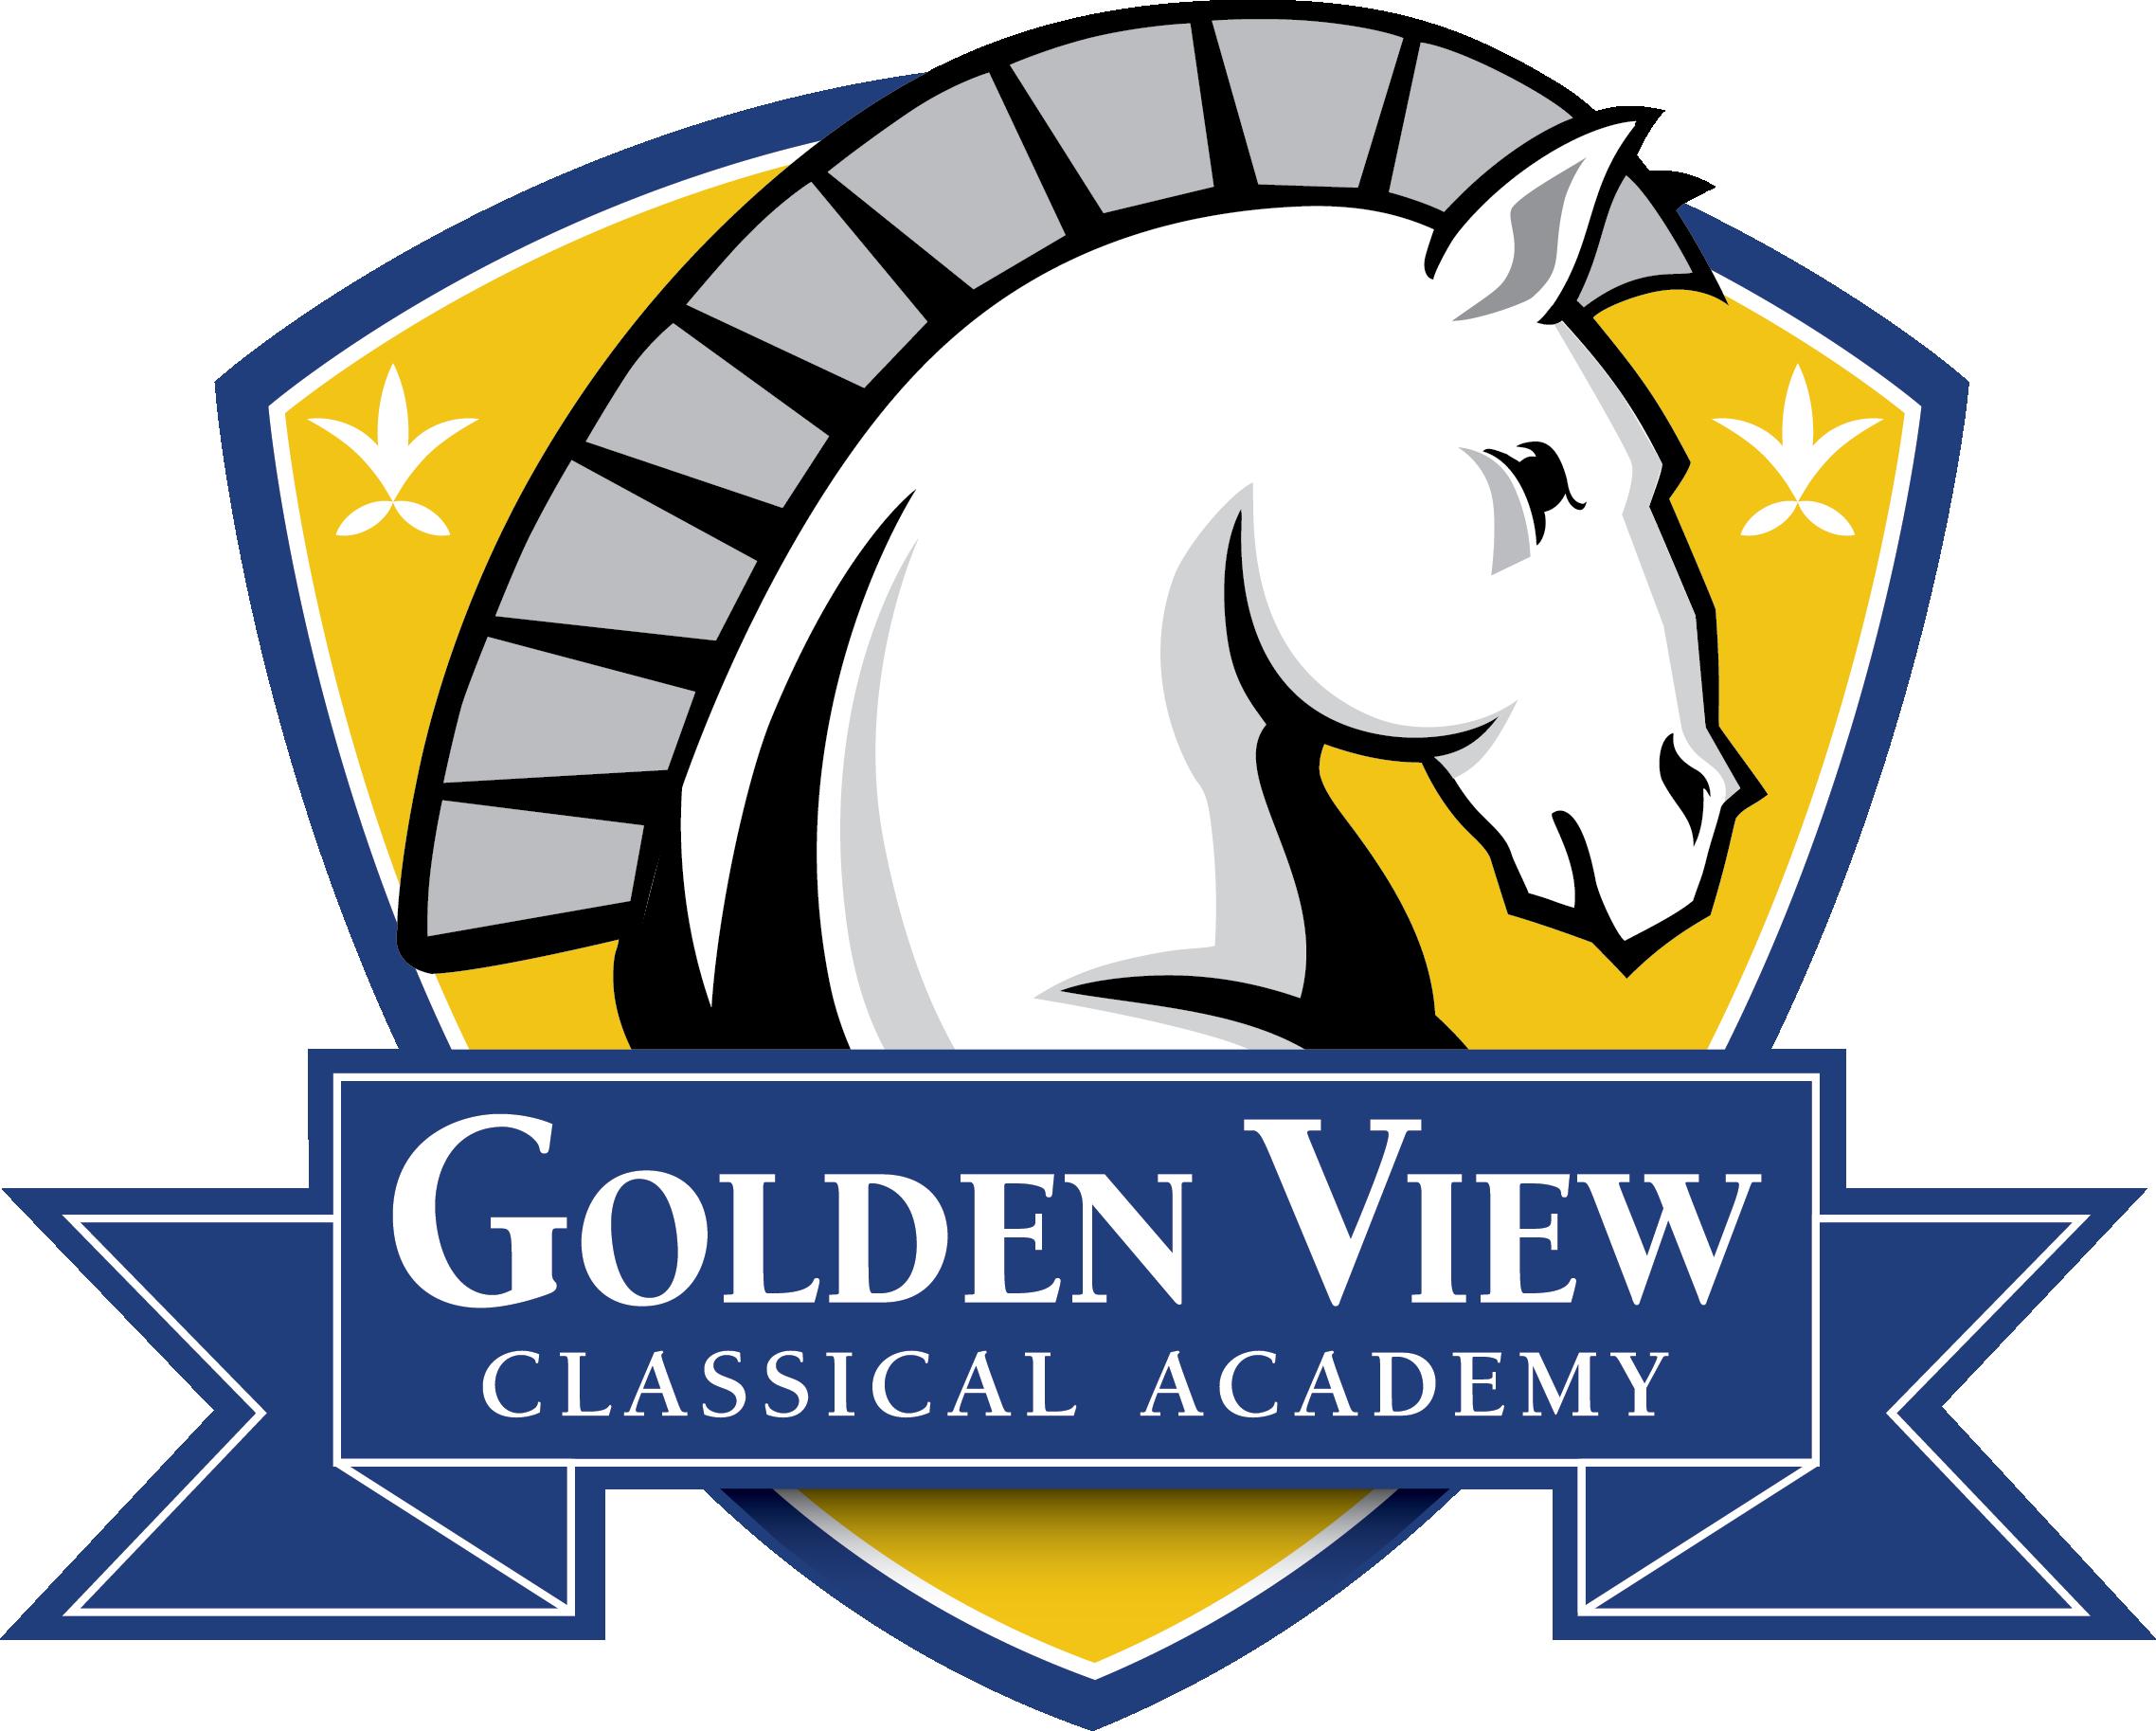 Honest clipart civic virtue. Golden view classical academy